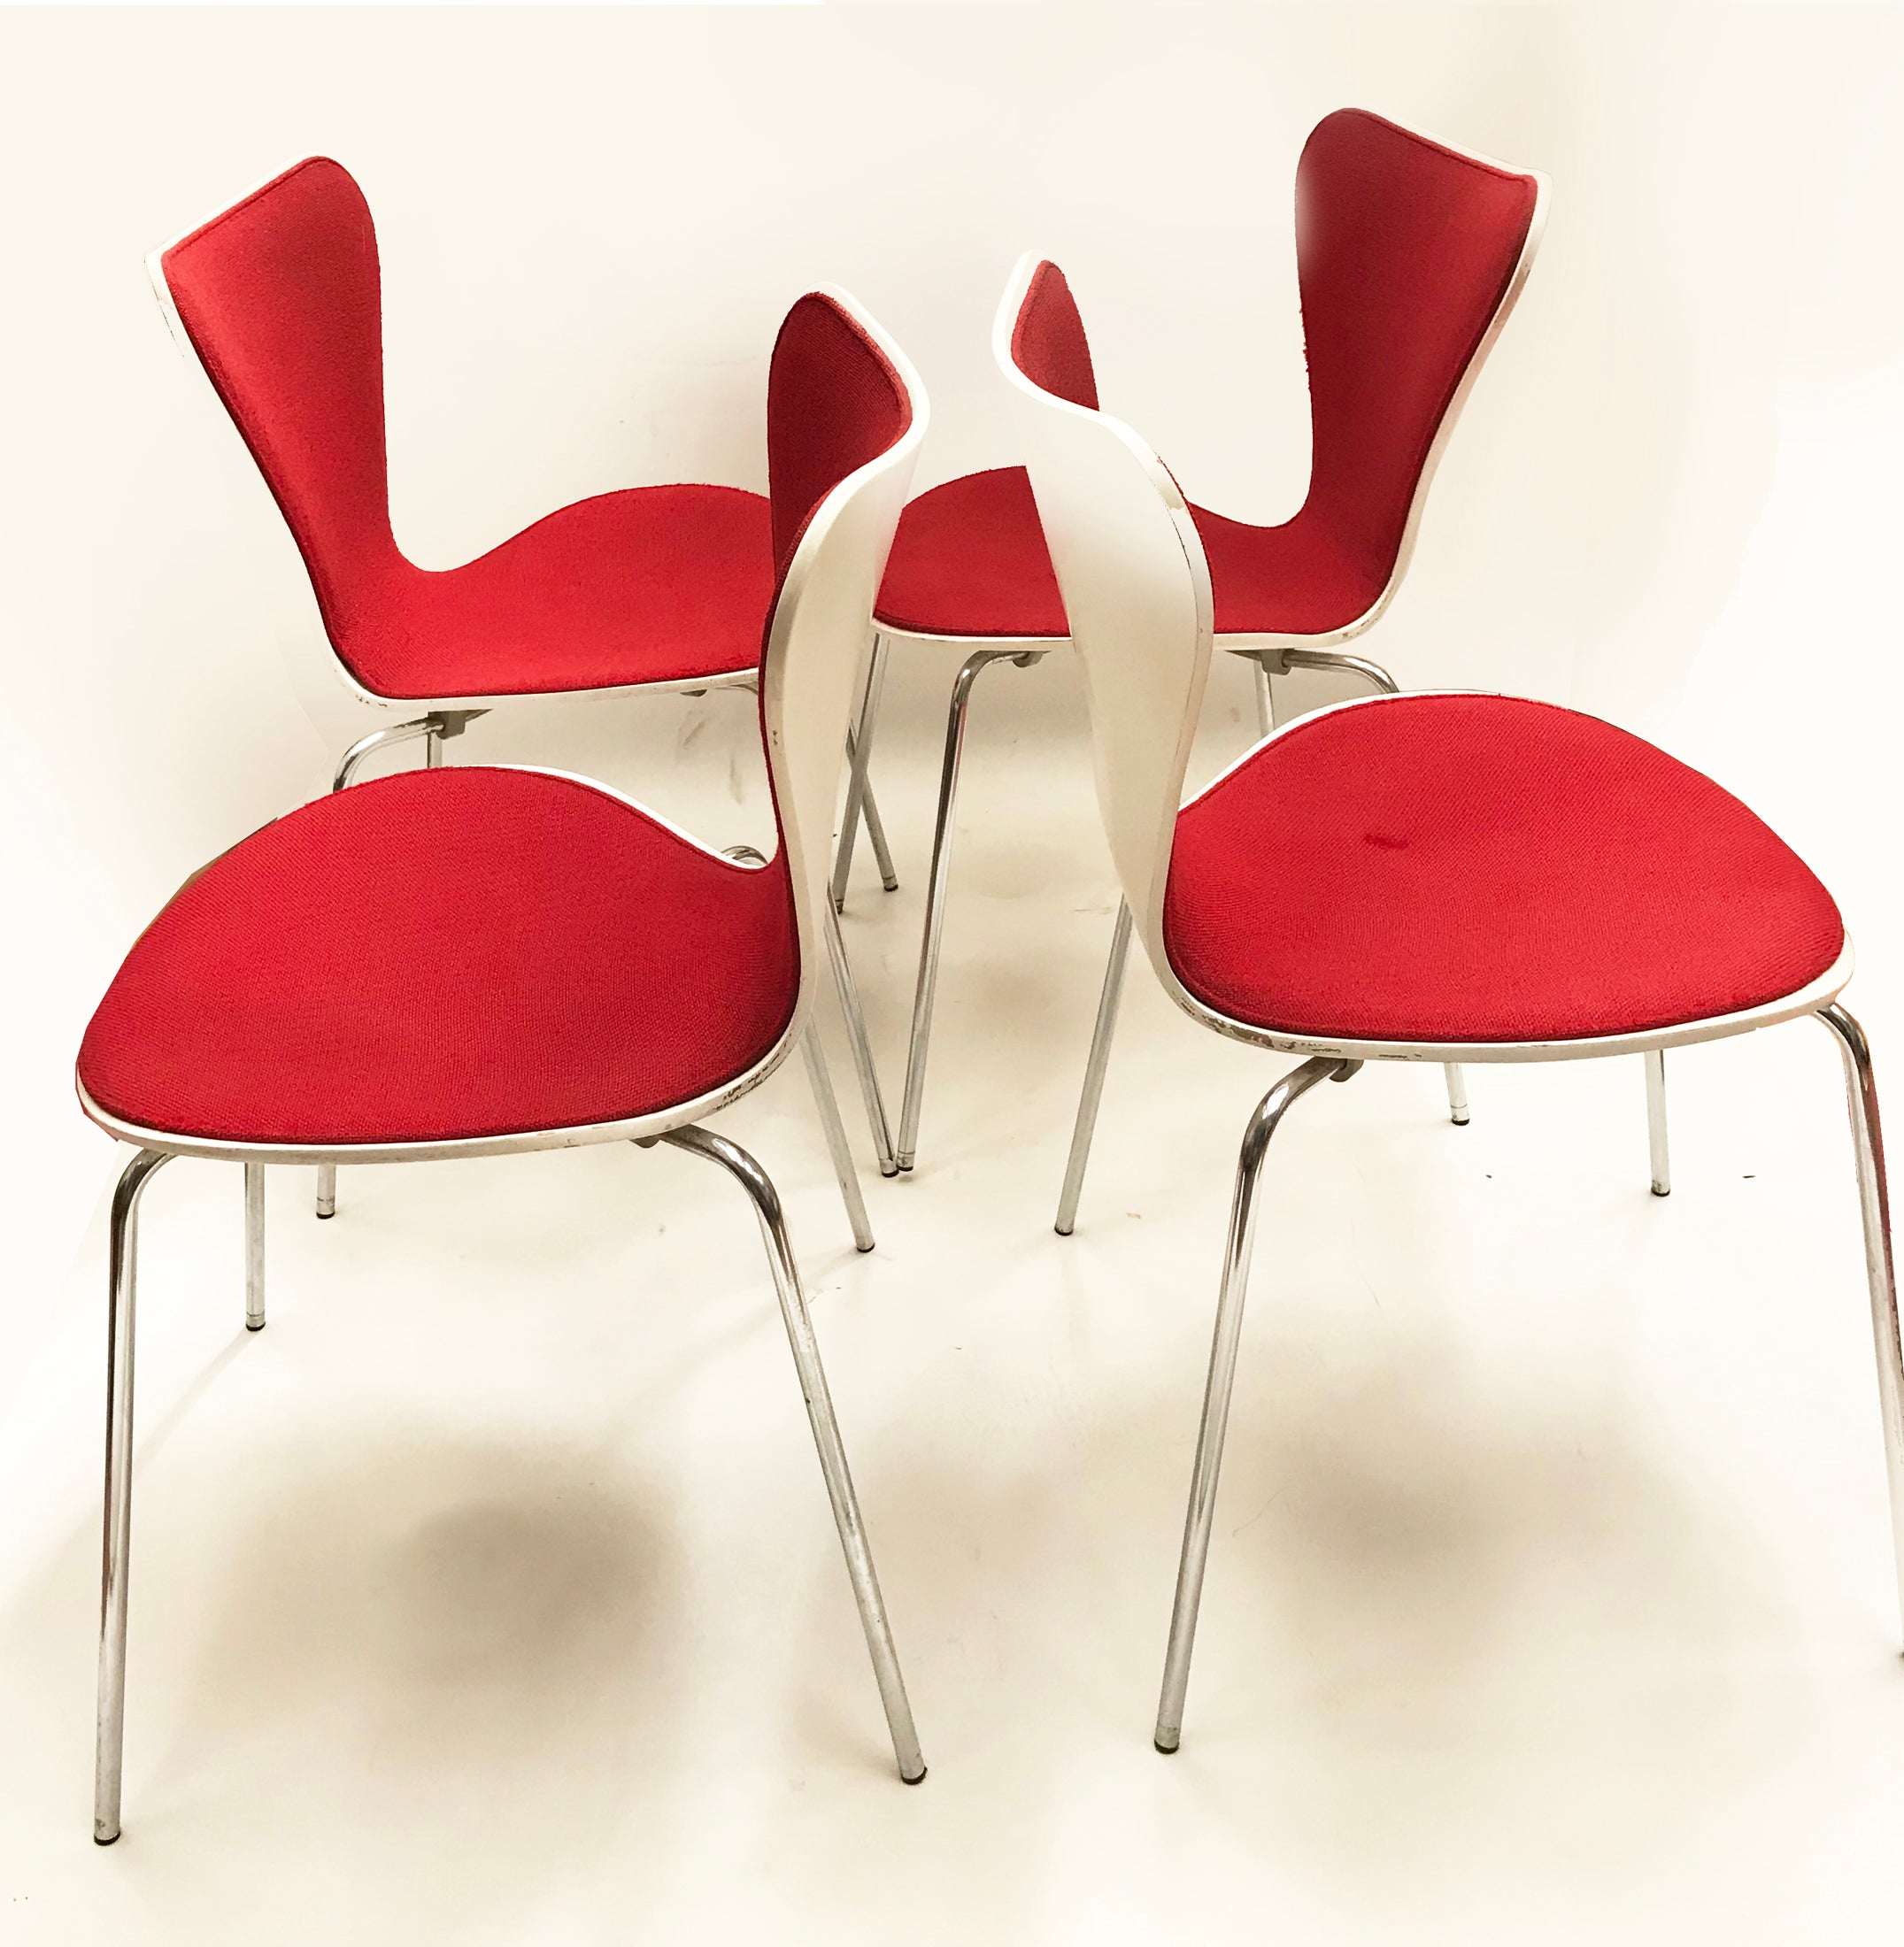 Midcentury Series 7 Chairs By Arne Jacobsen For Fritz Hansen,